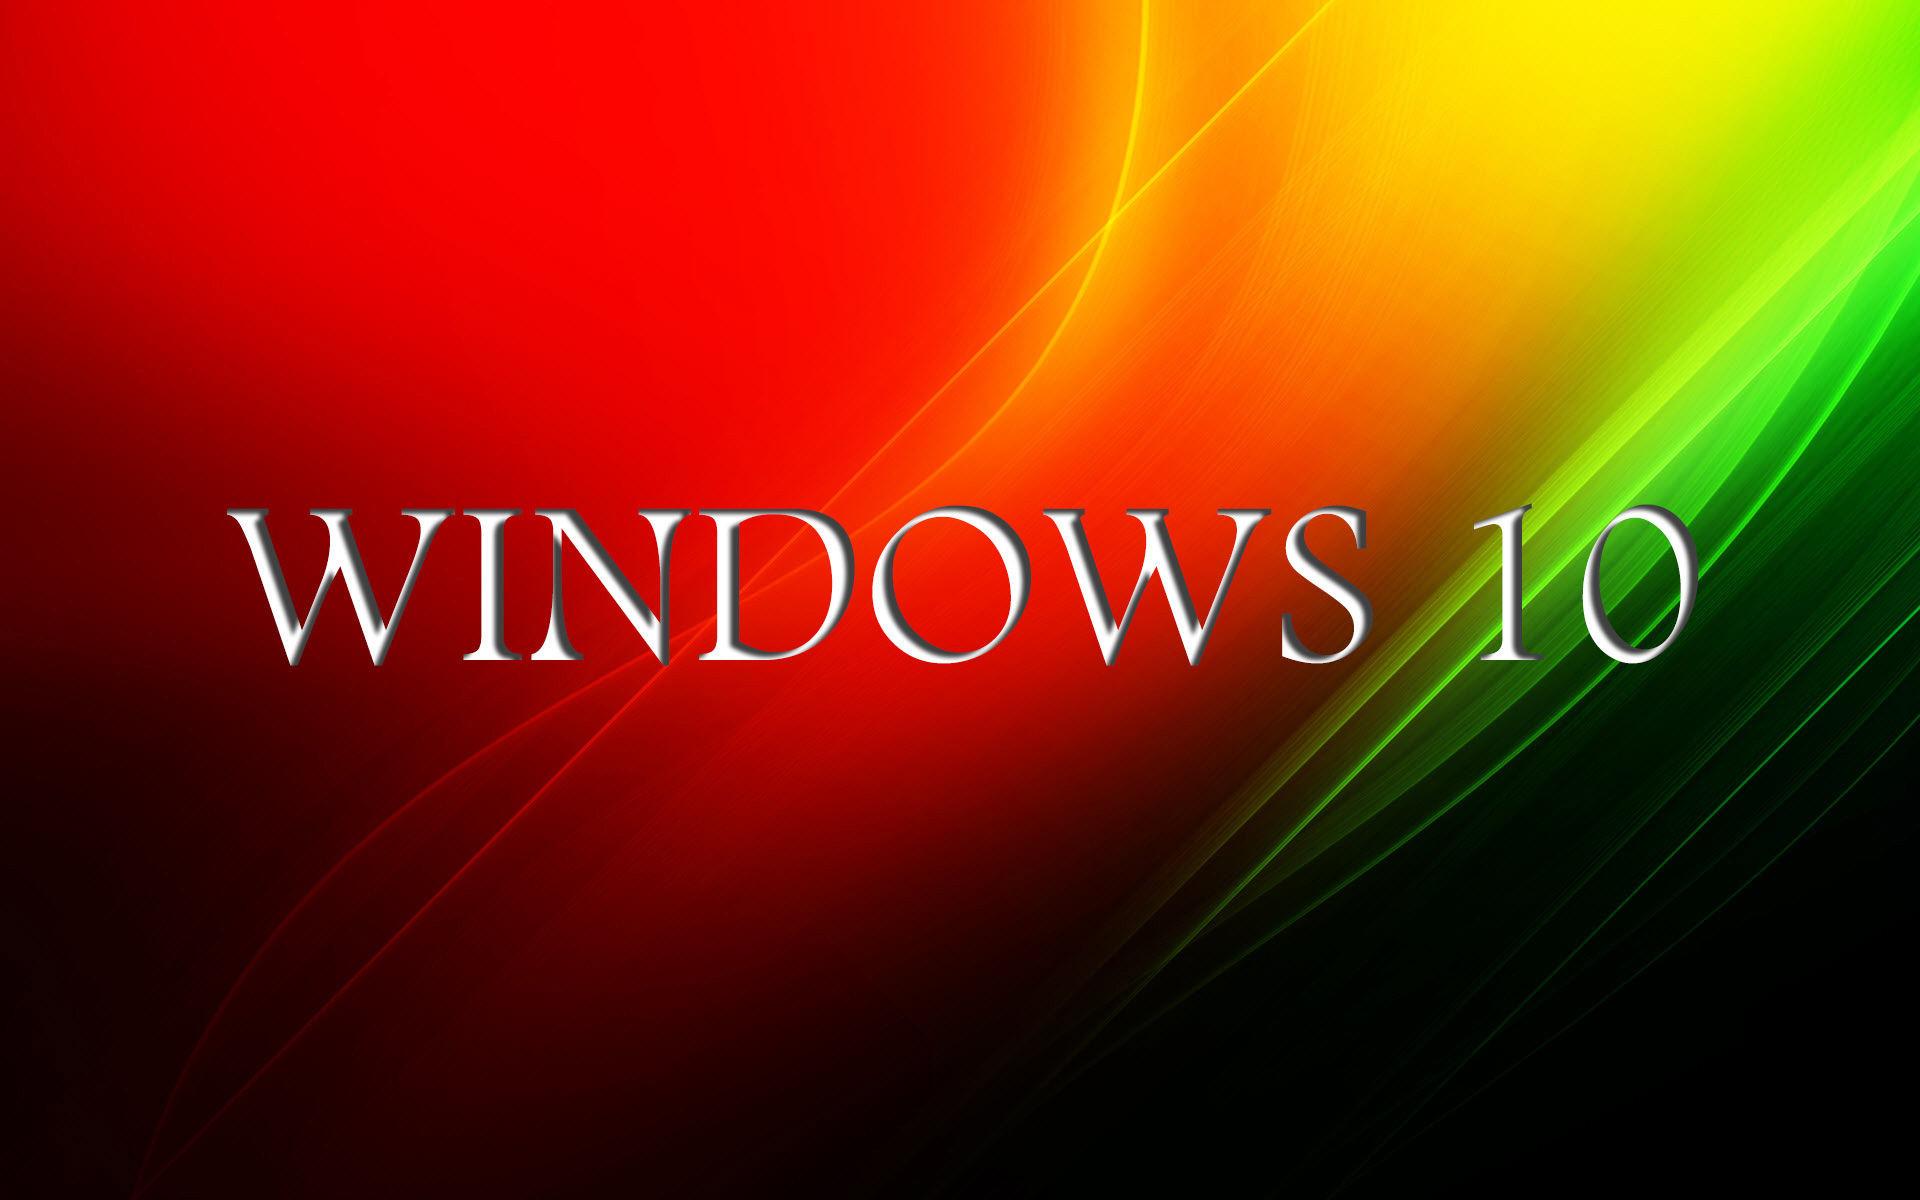 Wallpaper HD sur Windows 10